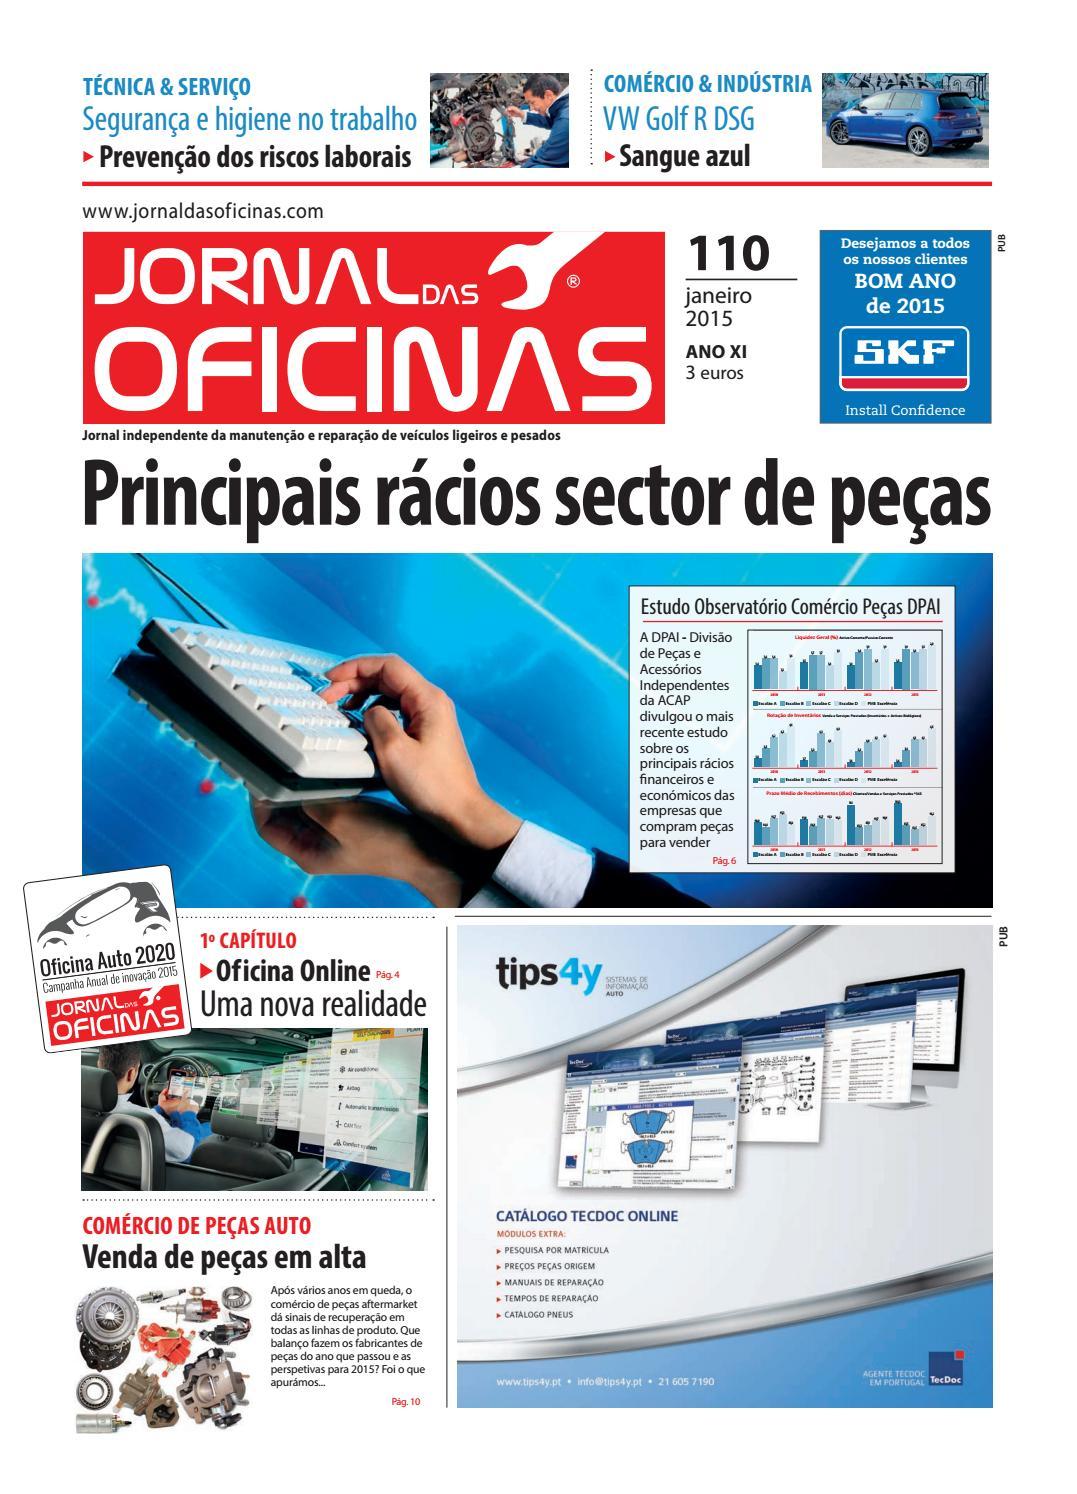 Jo110lr by Jornal das Oficinas - issuu ea7d2f2bb9d84